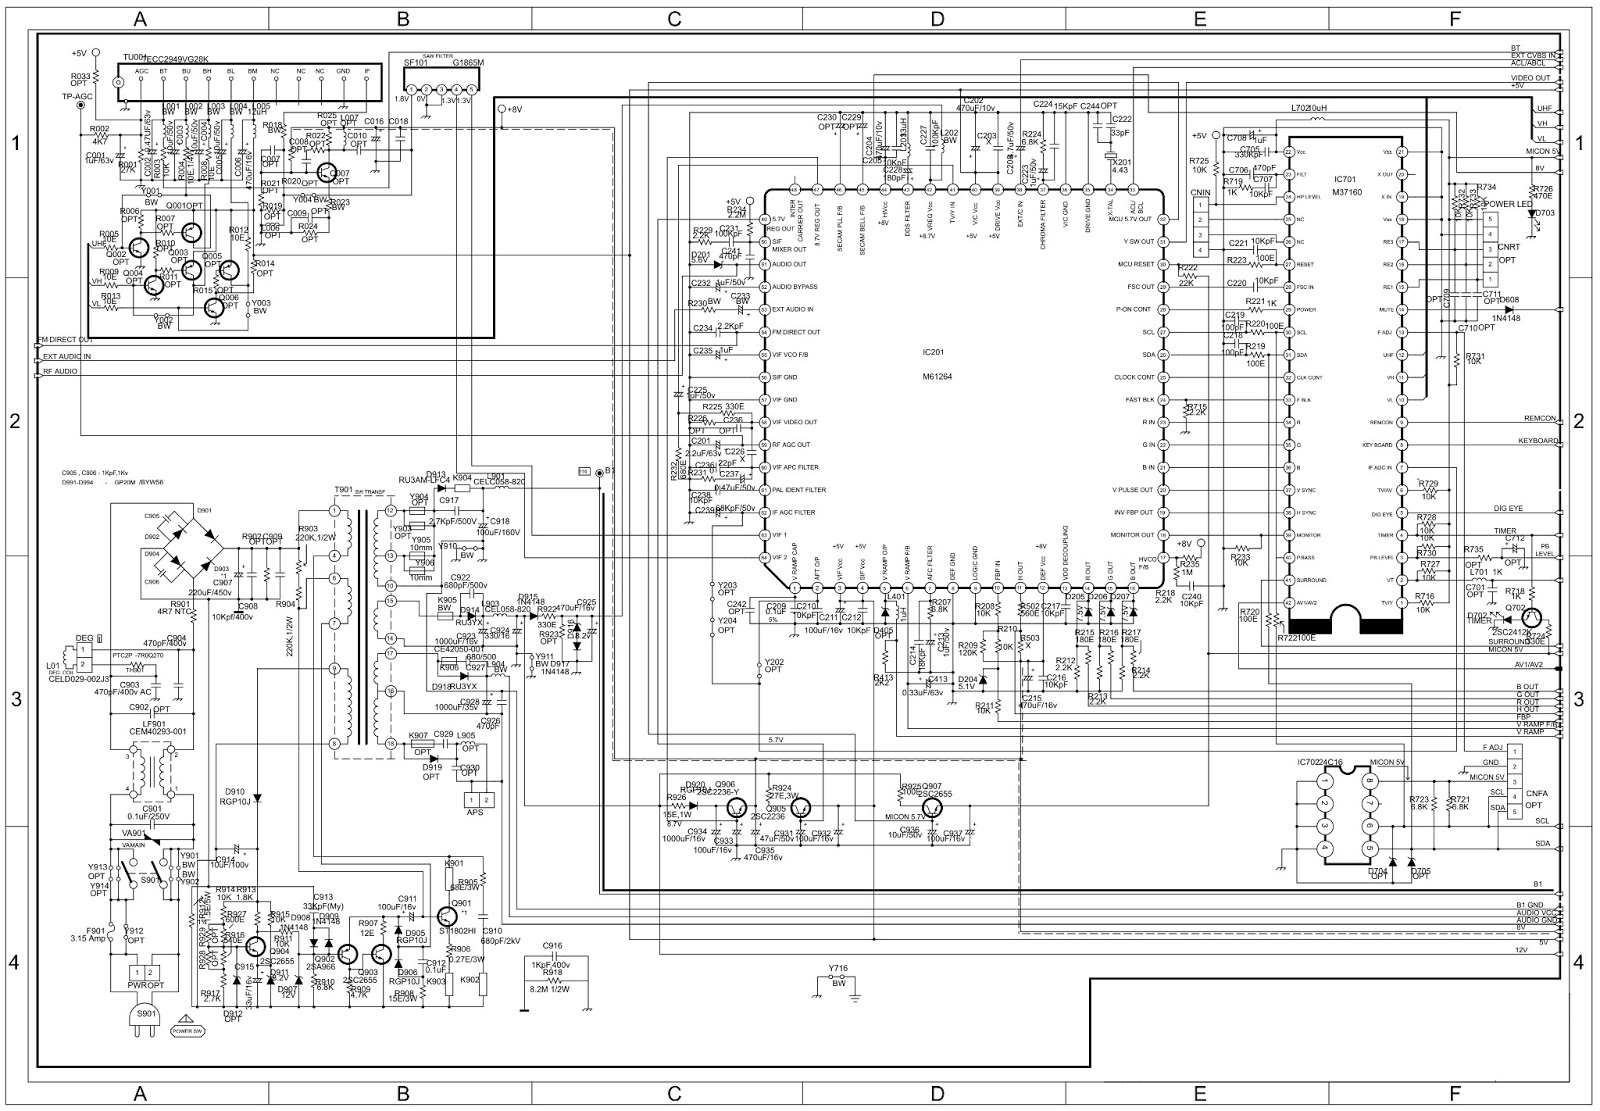 small resolution of ics wiring diagram onida igo onida delite 21 onida delite 14